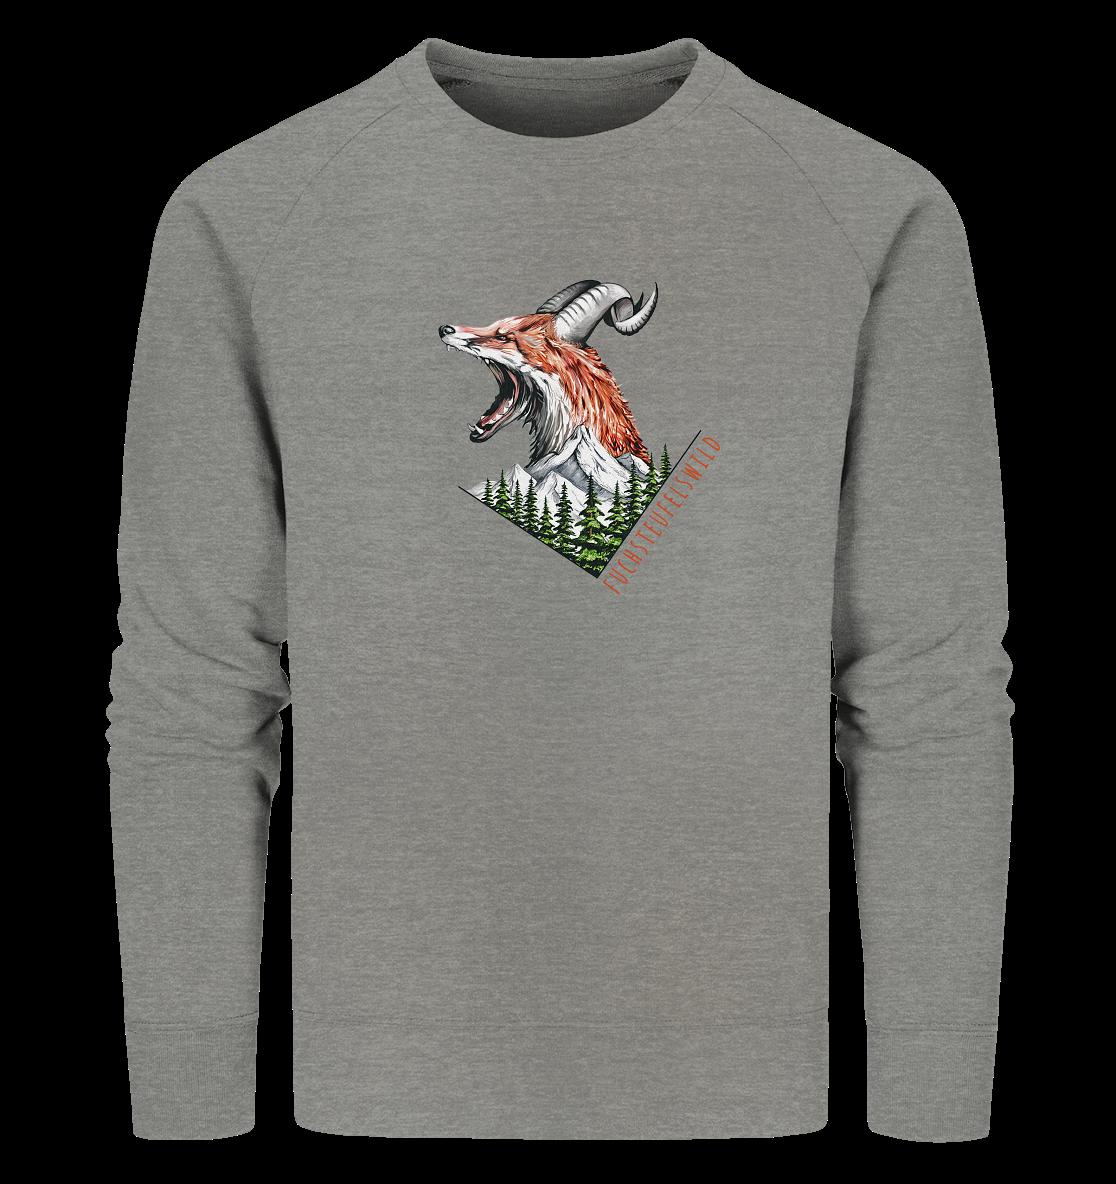 front-organic-sweatshirt-818381-1116x-1.png